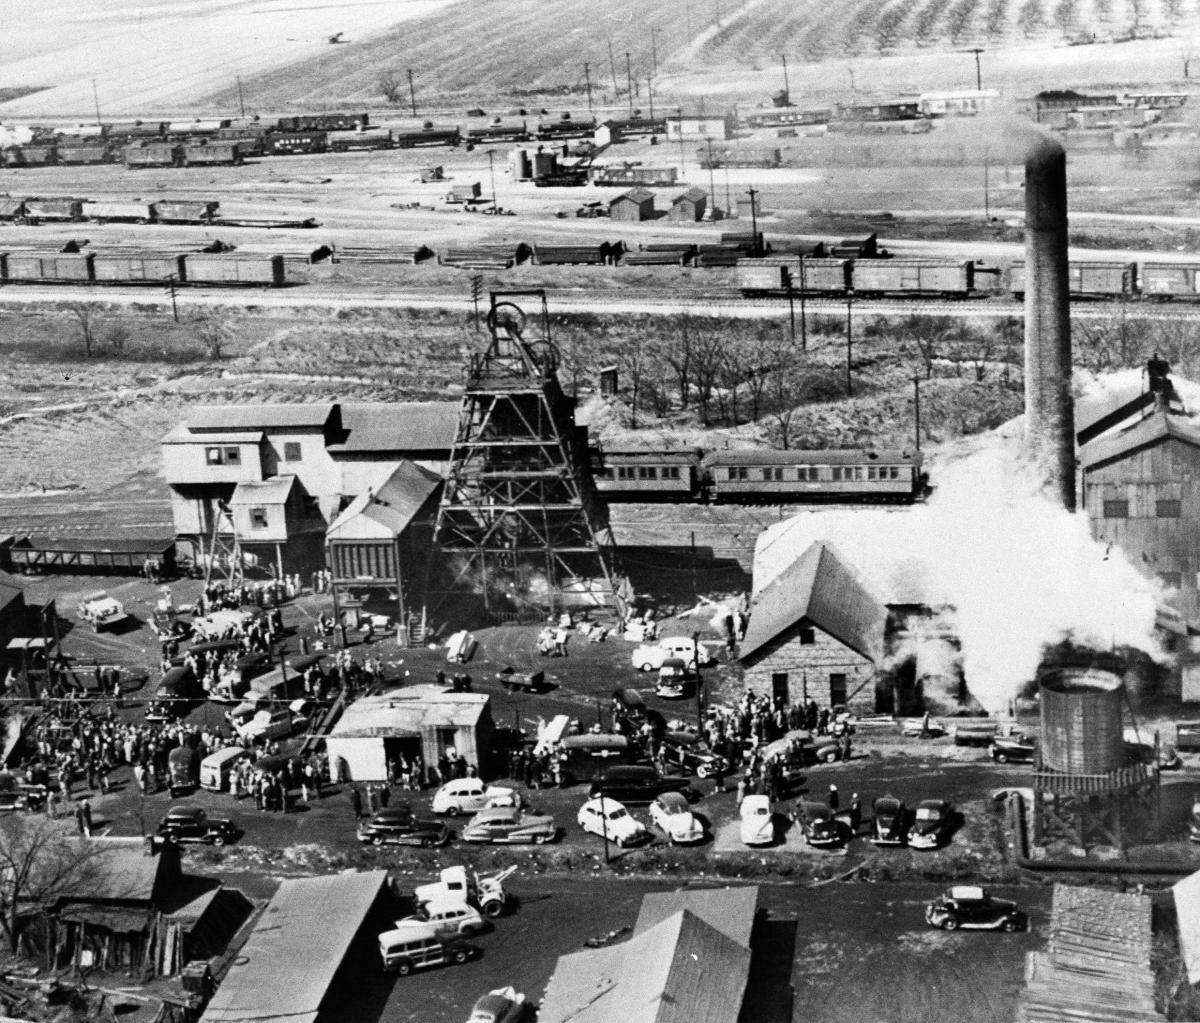 Centralia Mine Disaster